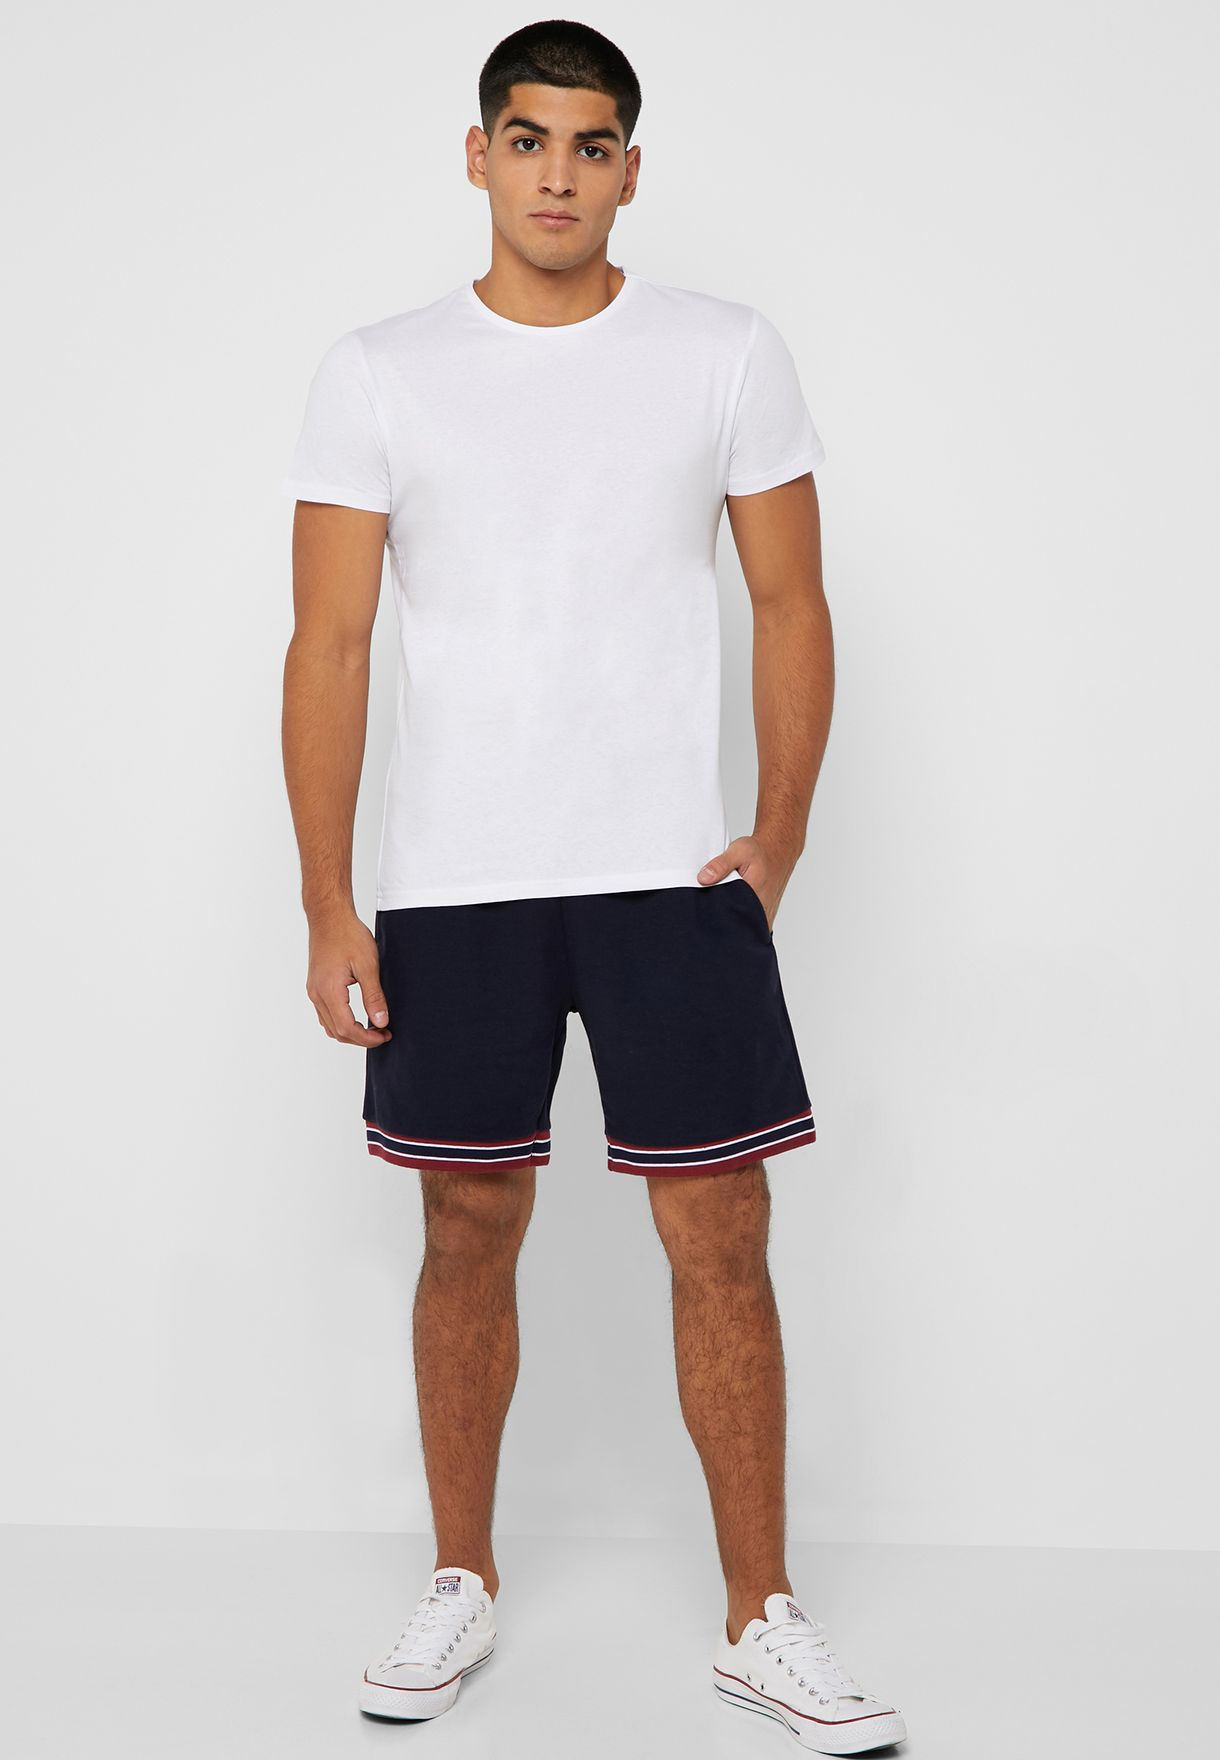 Tape Hemilton  Jersey Shorts